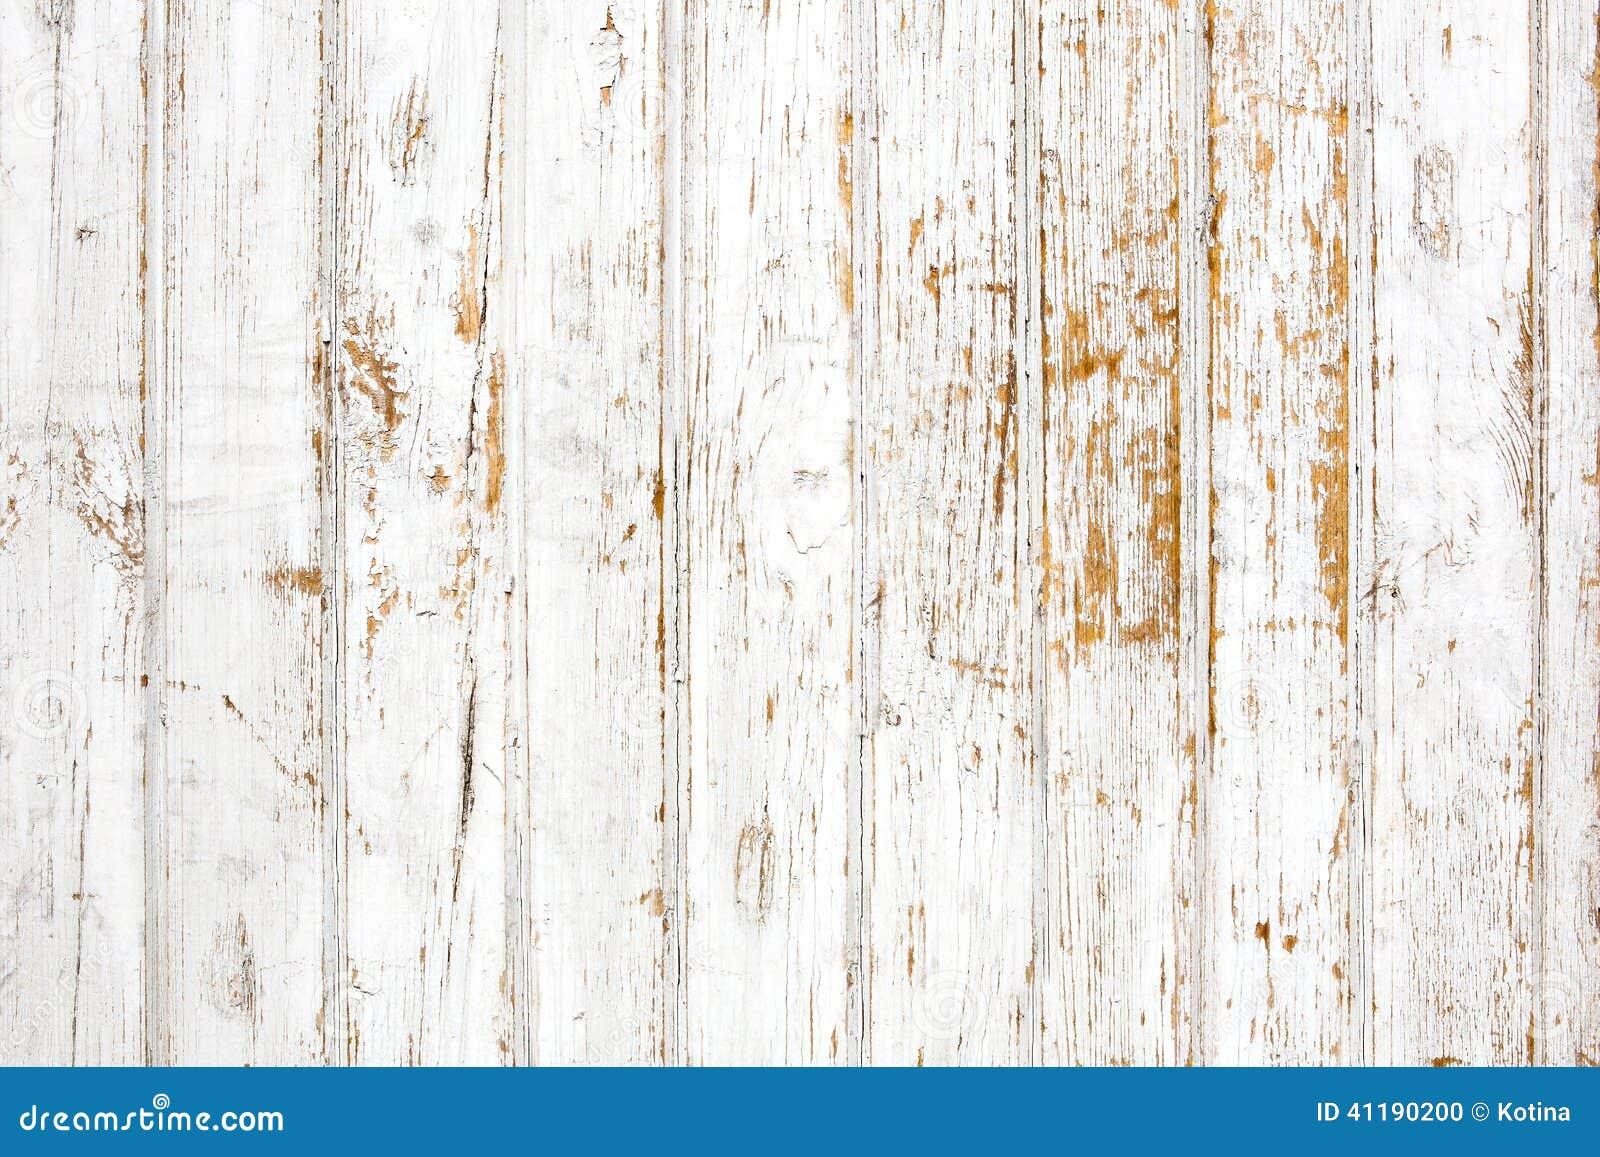 Patttern For Painted Floor